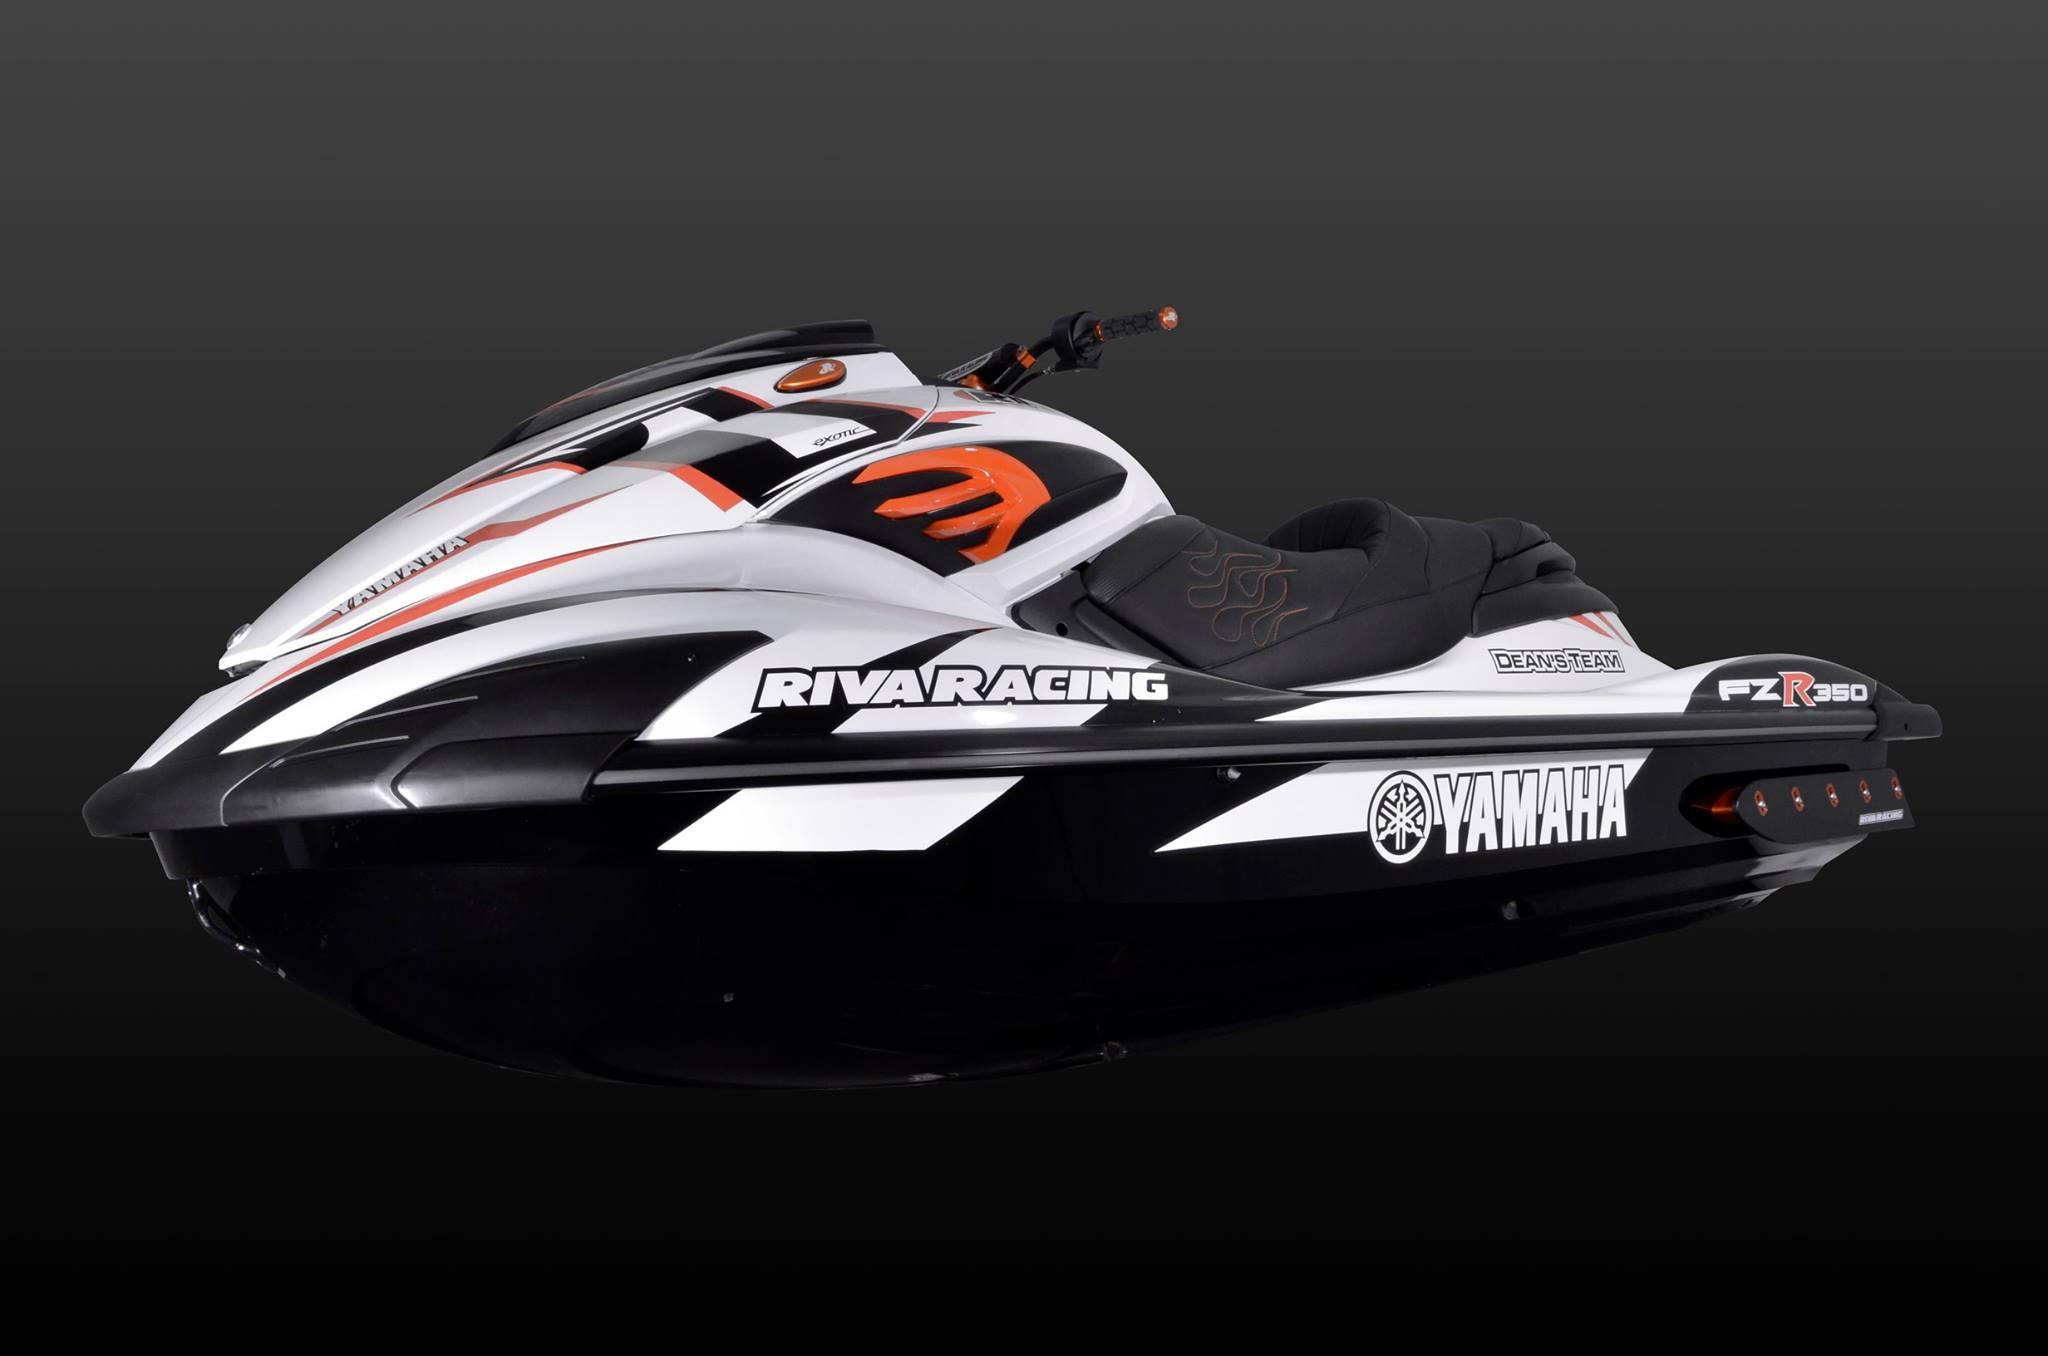 RIVA Racing Yamaha FZR 350 2016 petici³n Motos de agua